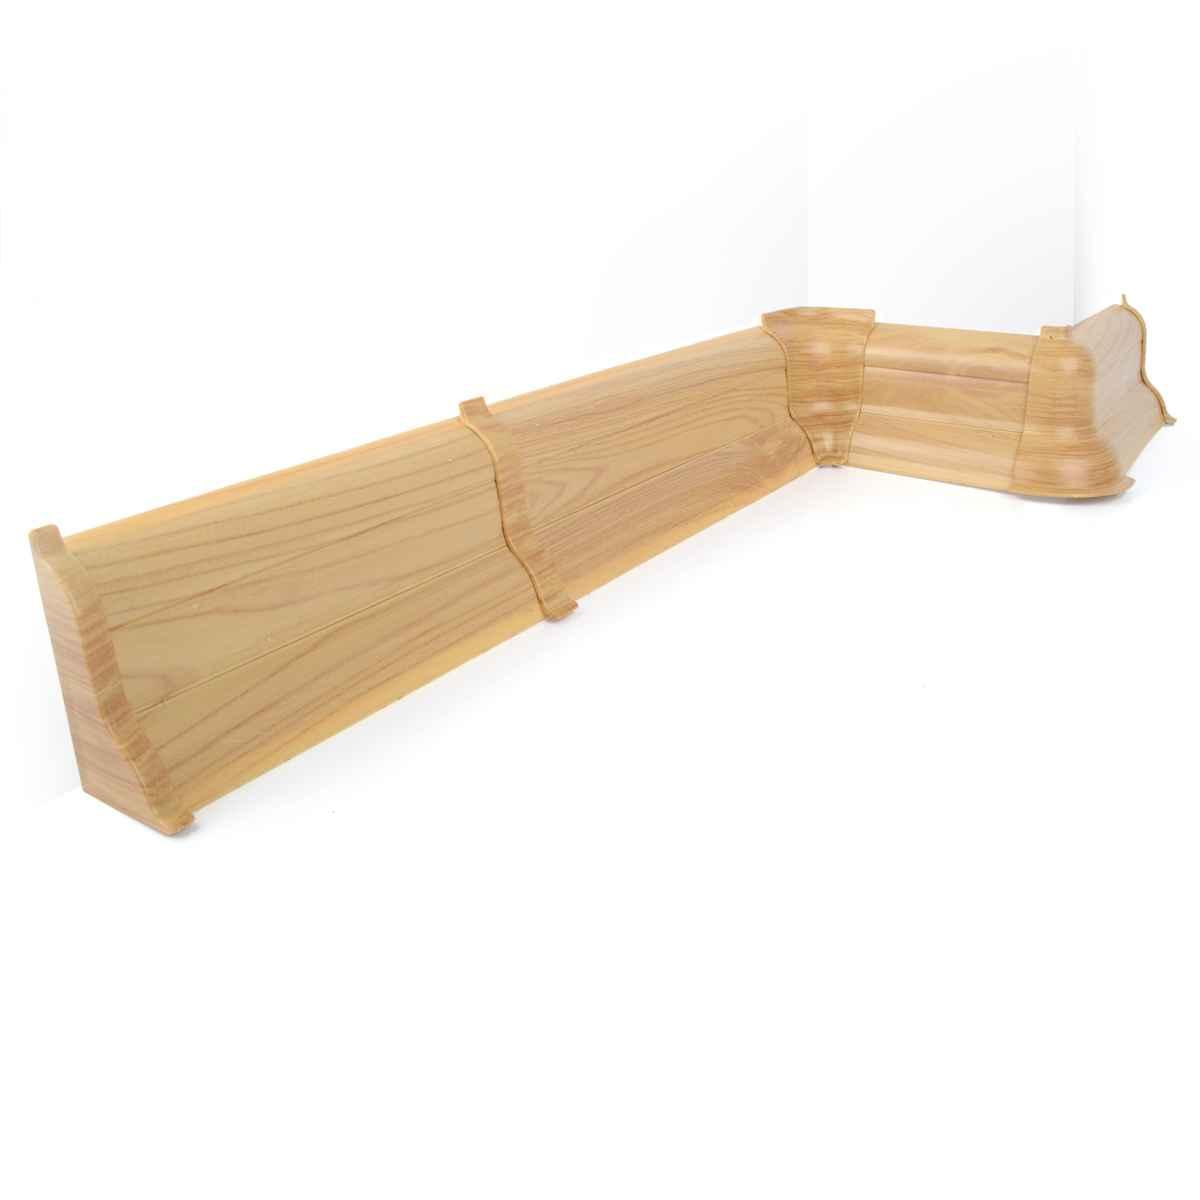 Hervorragend Fussleisten Sockelleisten PVC Kunstoff Laminat Sockelleiste  EX29